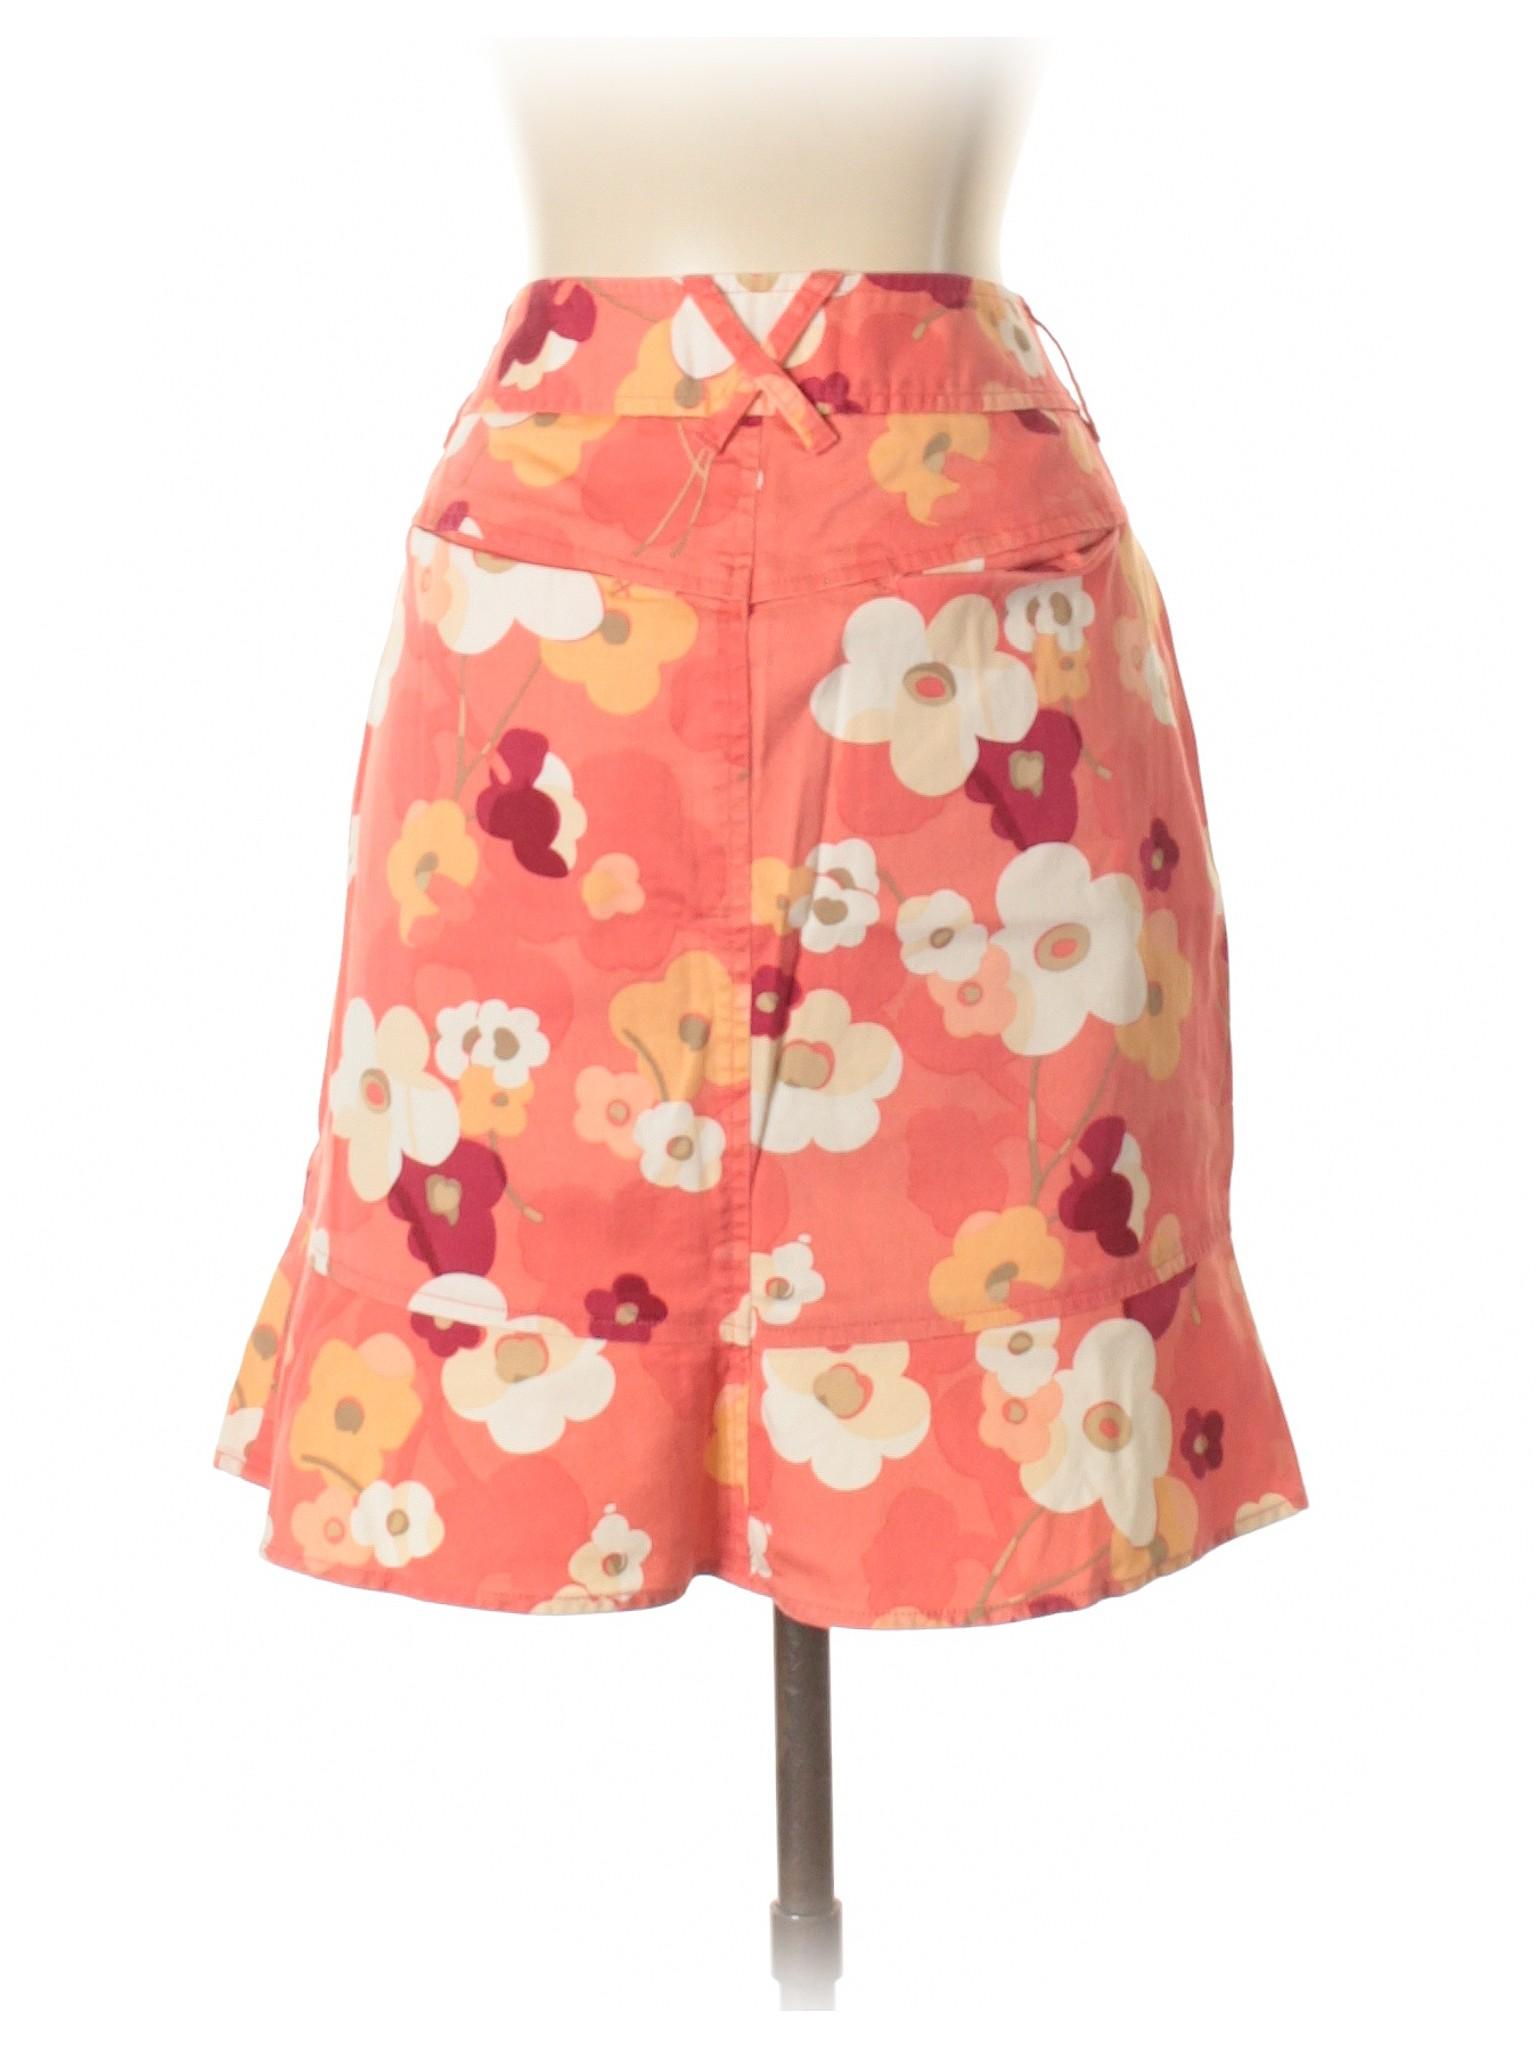 Skirt Casual Casual Boutique Casual Boutique Skirt Skirt Casual Skirt Boutique Skirt Casual Boutique Boutique Skirt Casual Boutique qTw0A0H